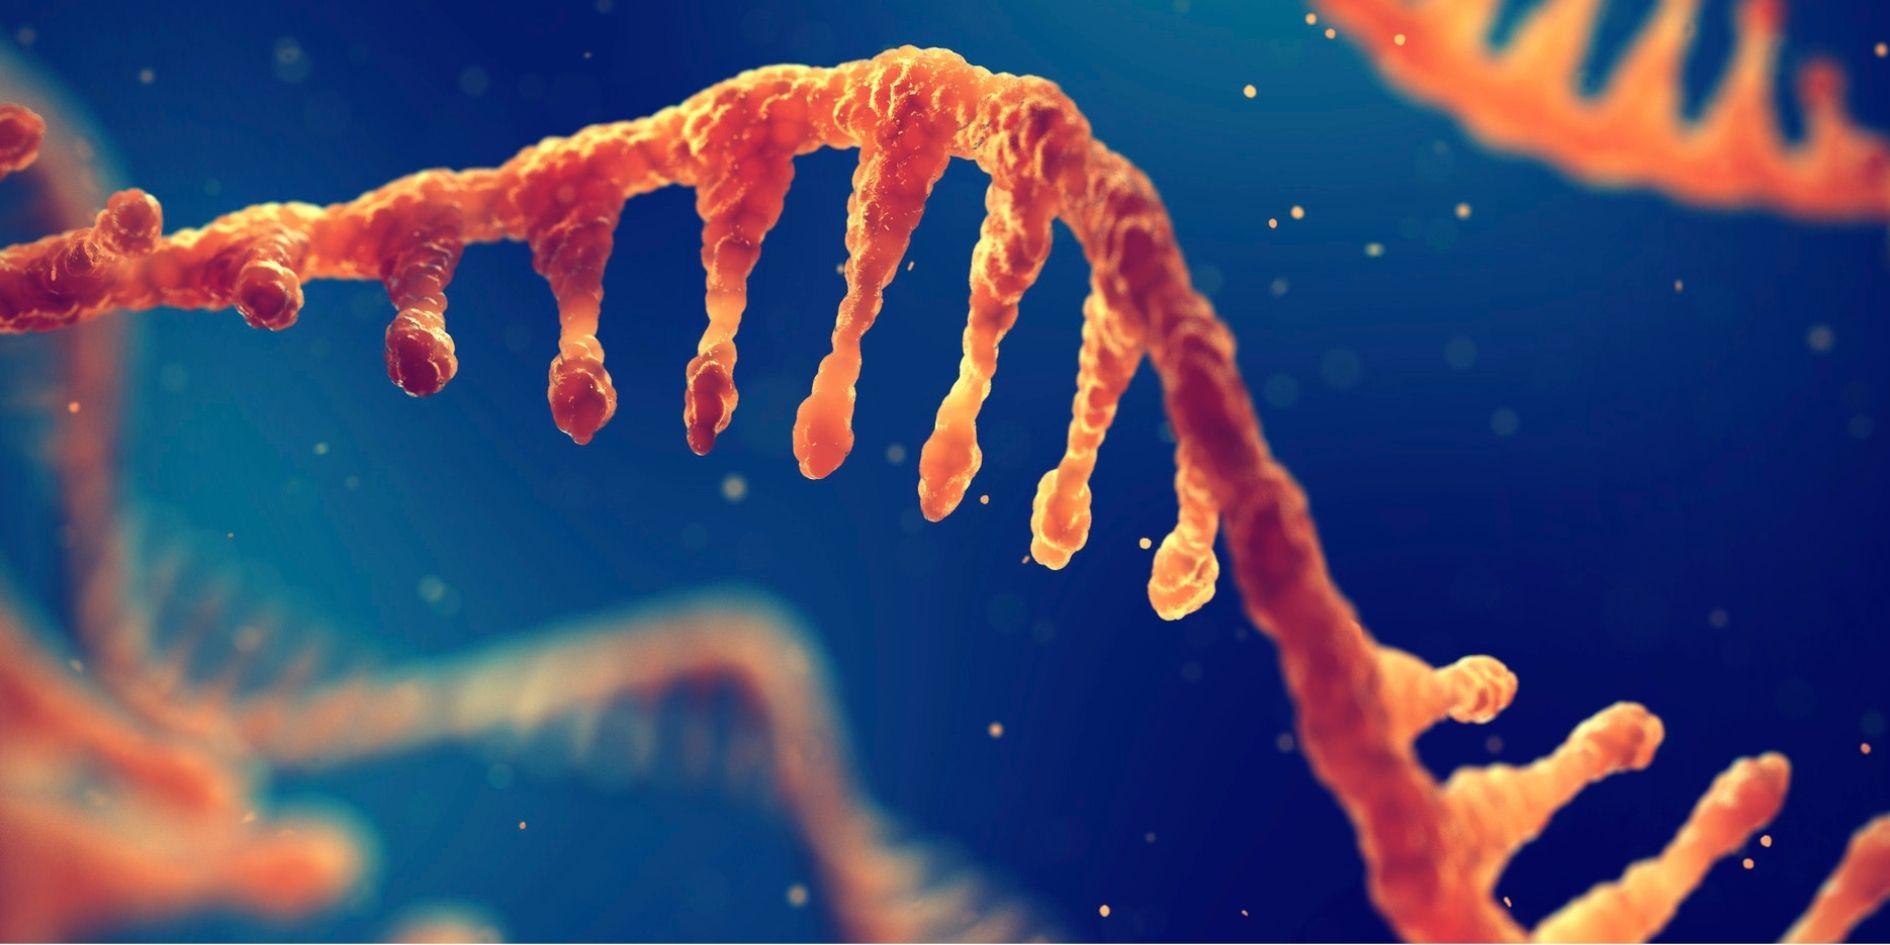 mRNA技術でマウスの20匹中19匹で「がん細胞を完全消滅」させたと発表! 臨床試験も開始!